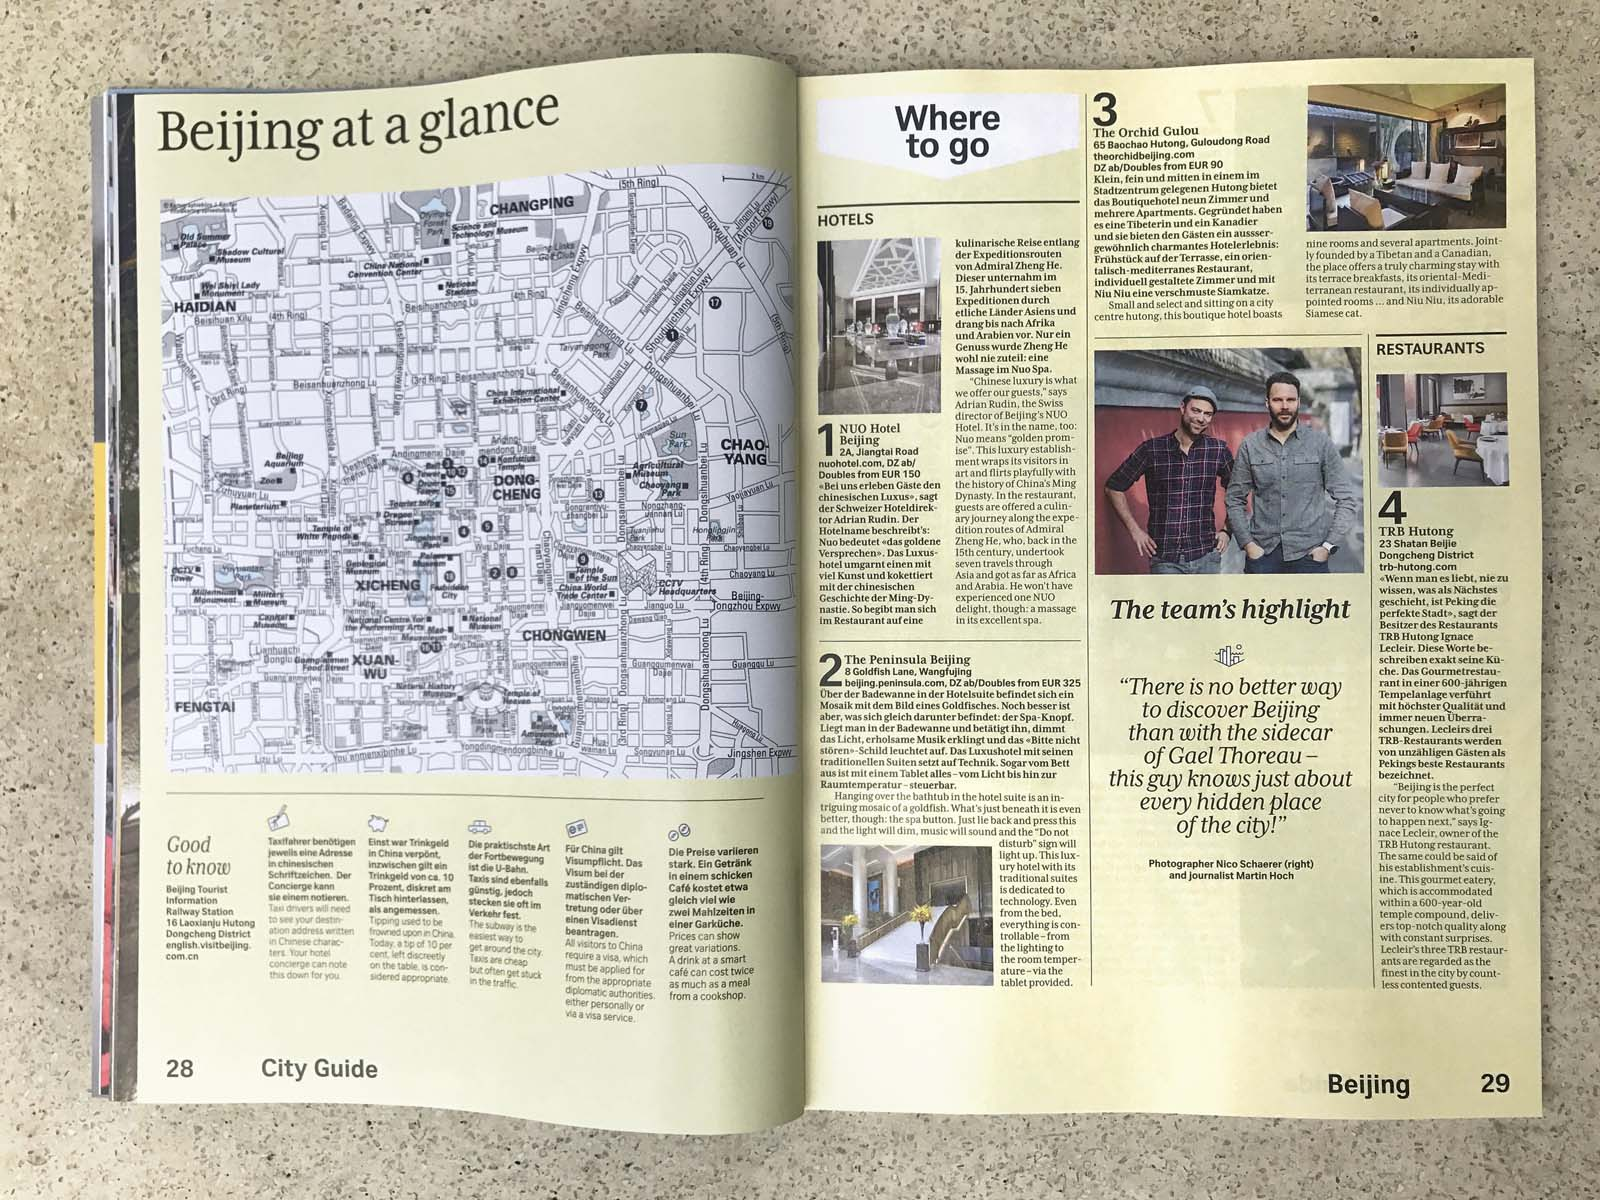 Swiss Magazine Peking 11 | nuvu